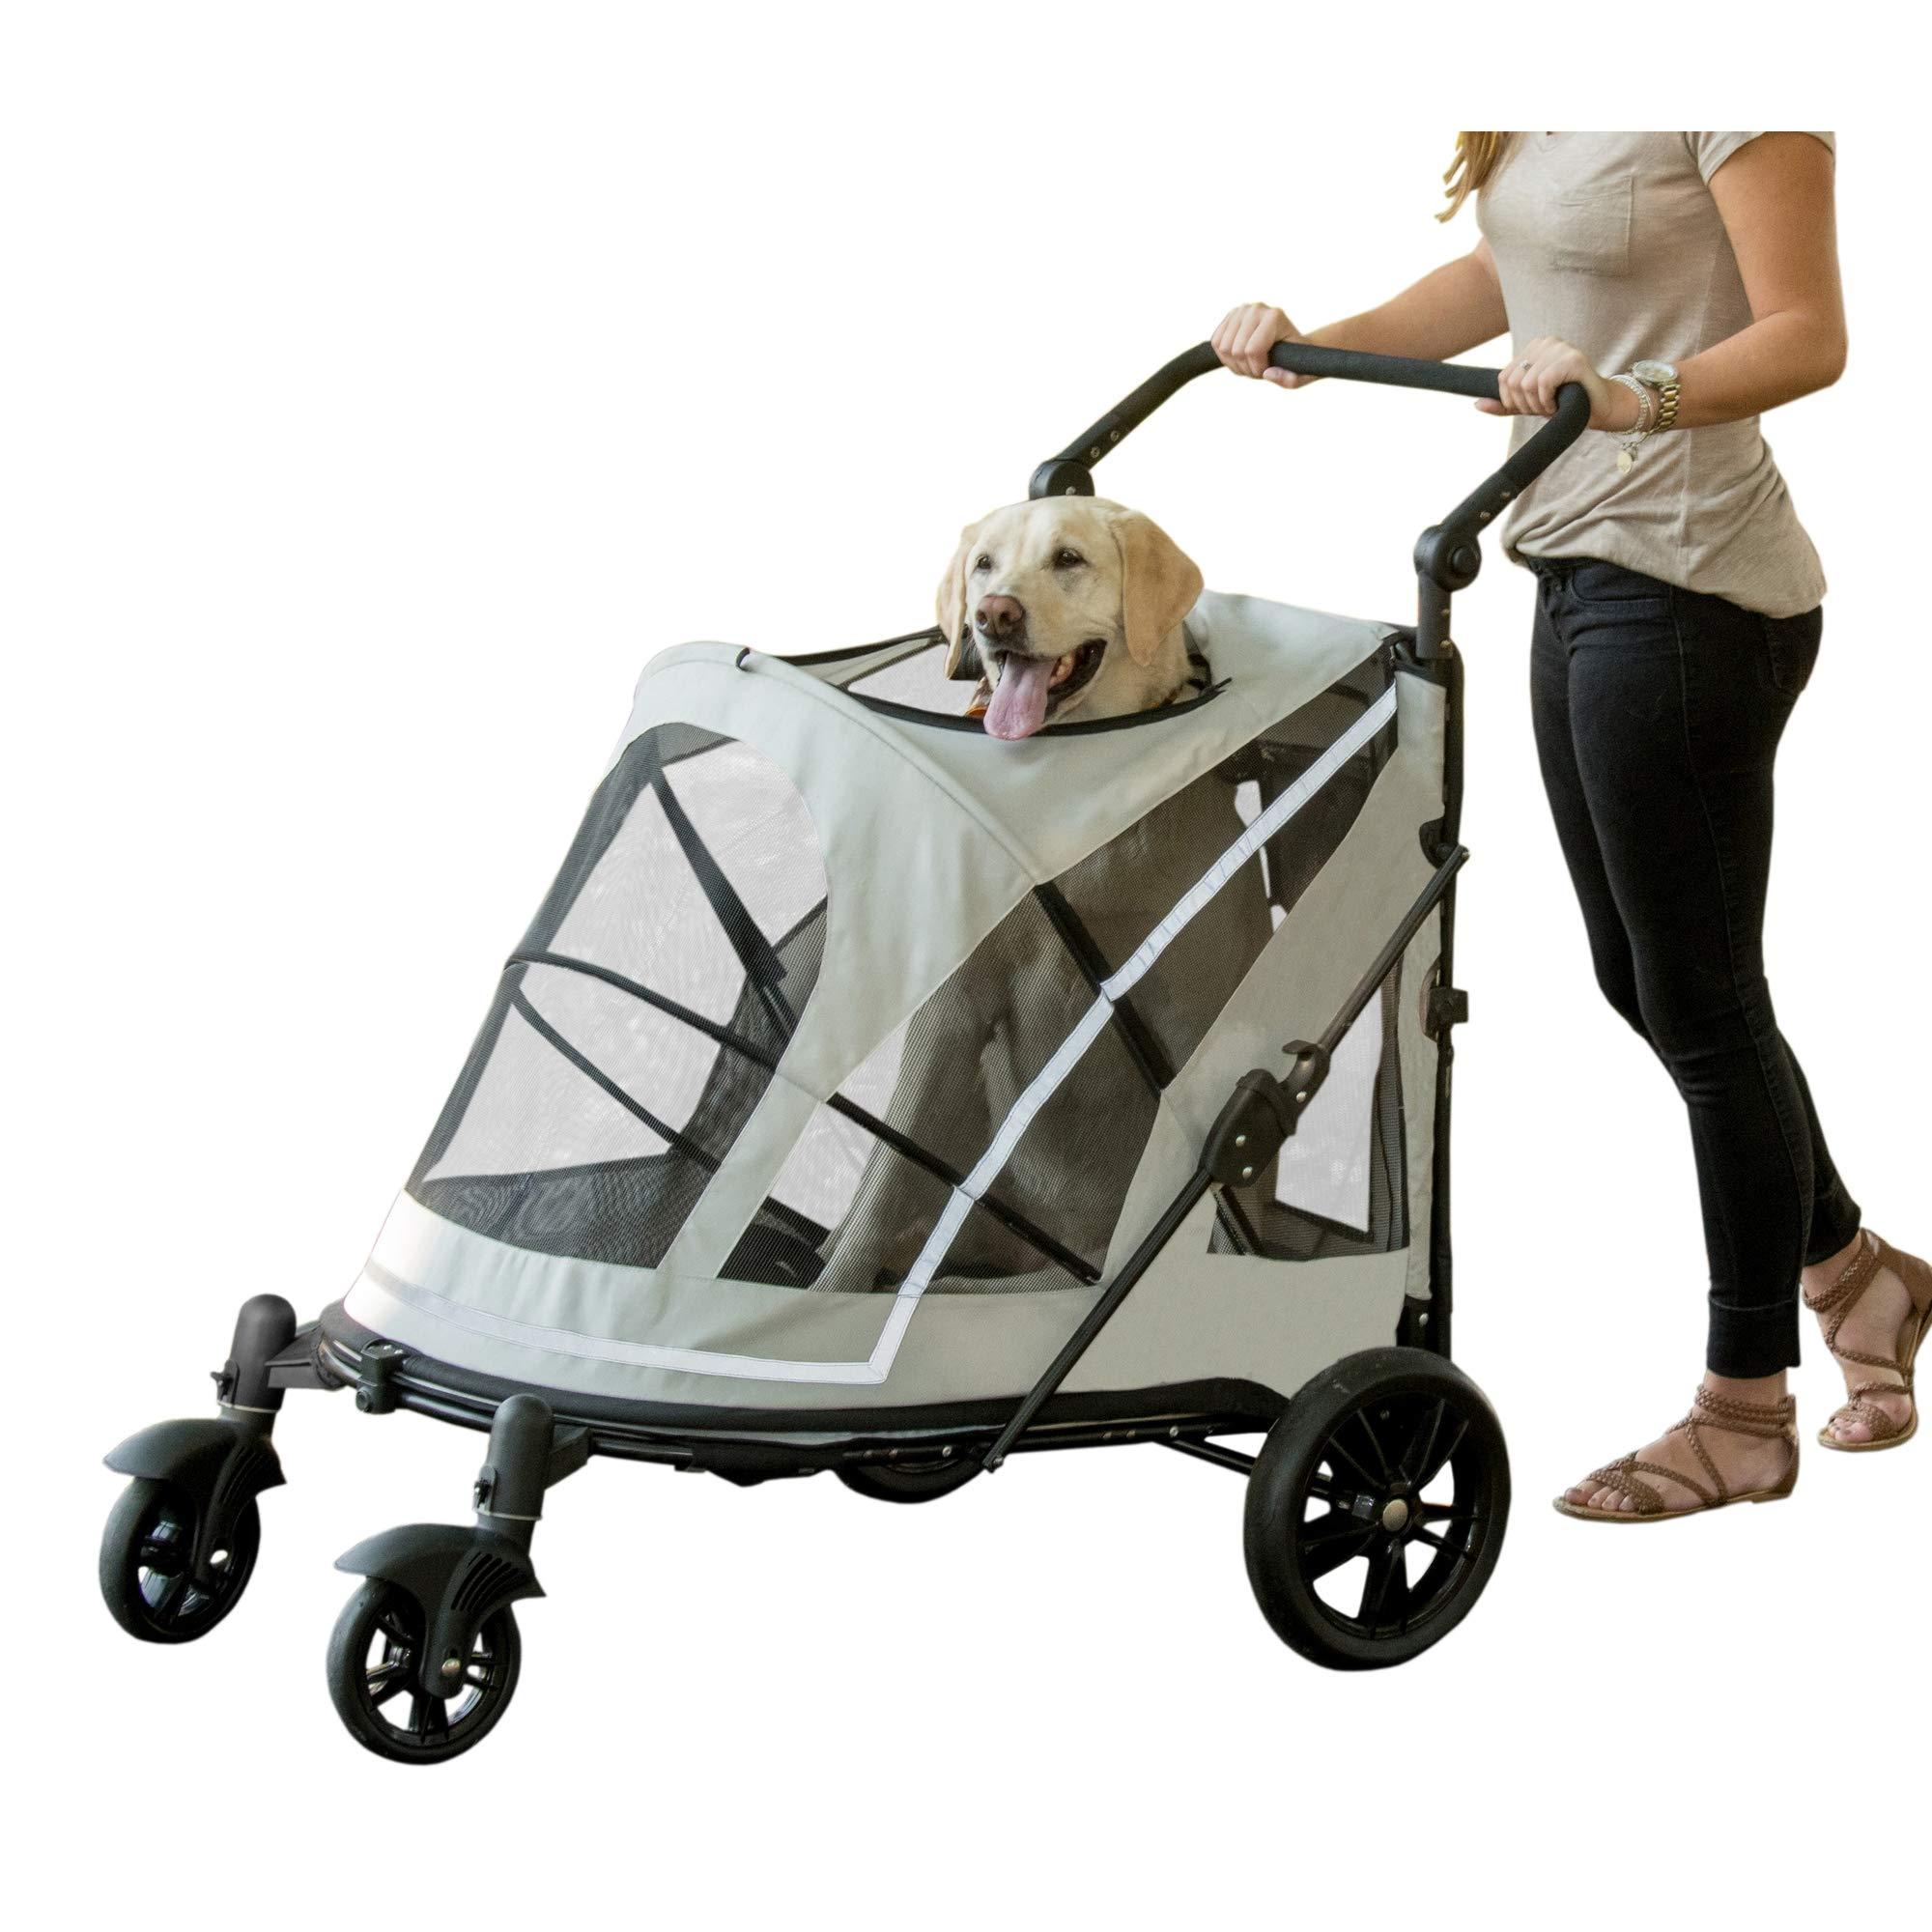 Pet Gear PG8850NZFO No-Zip Expedition Pet Stroller by Pet Gear